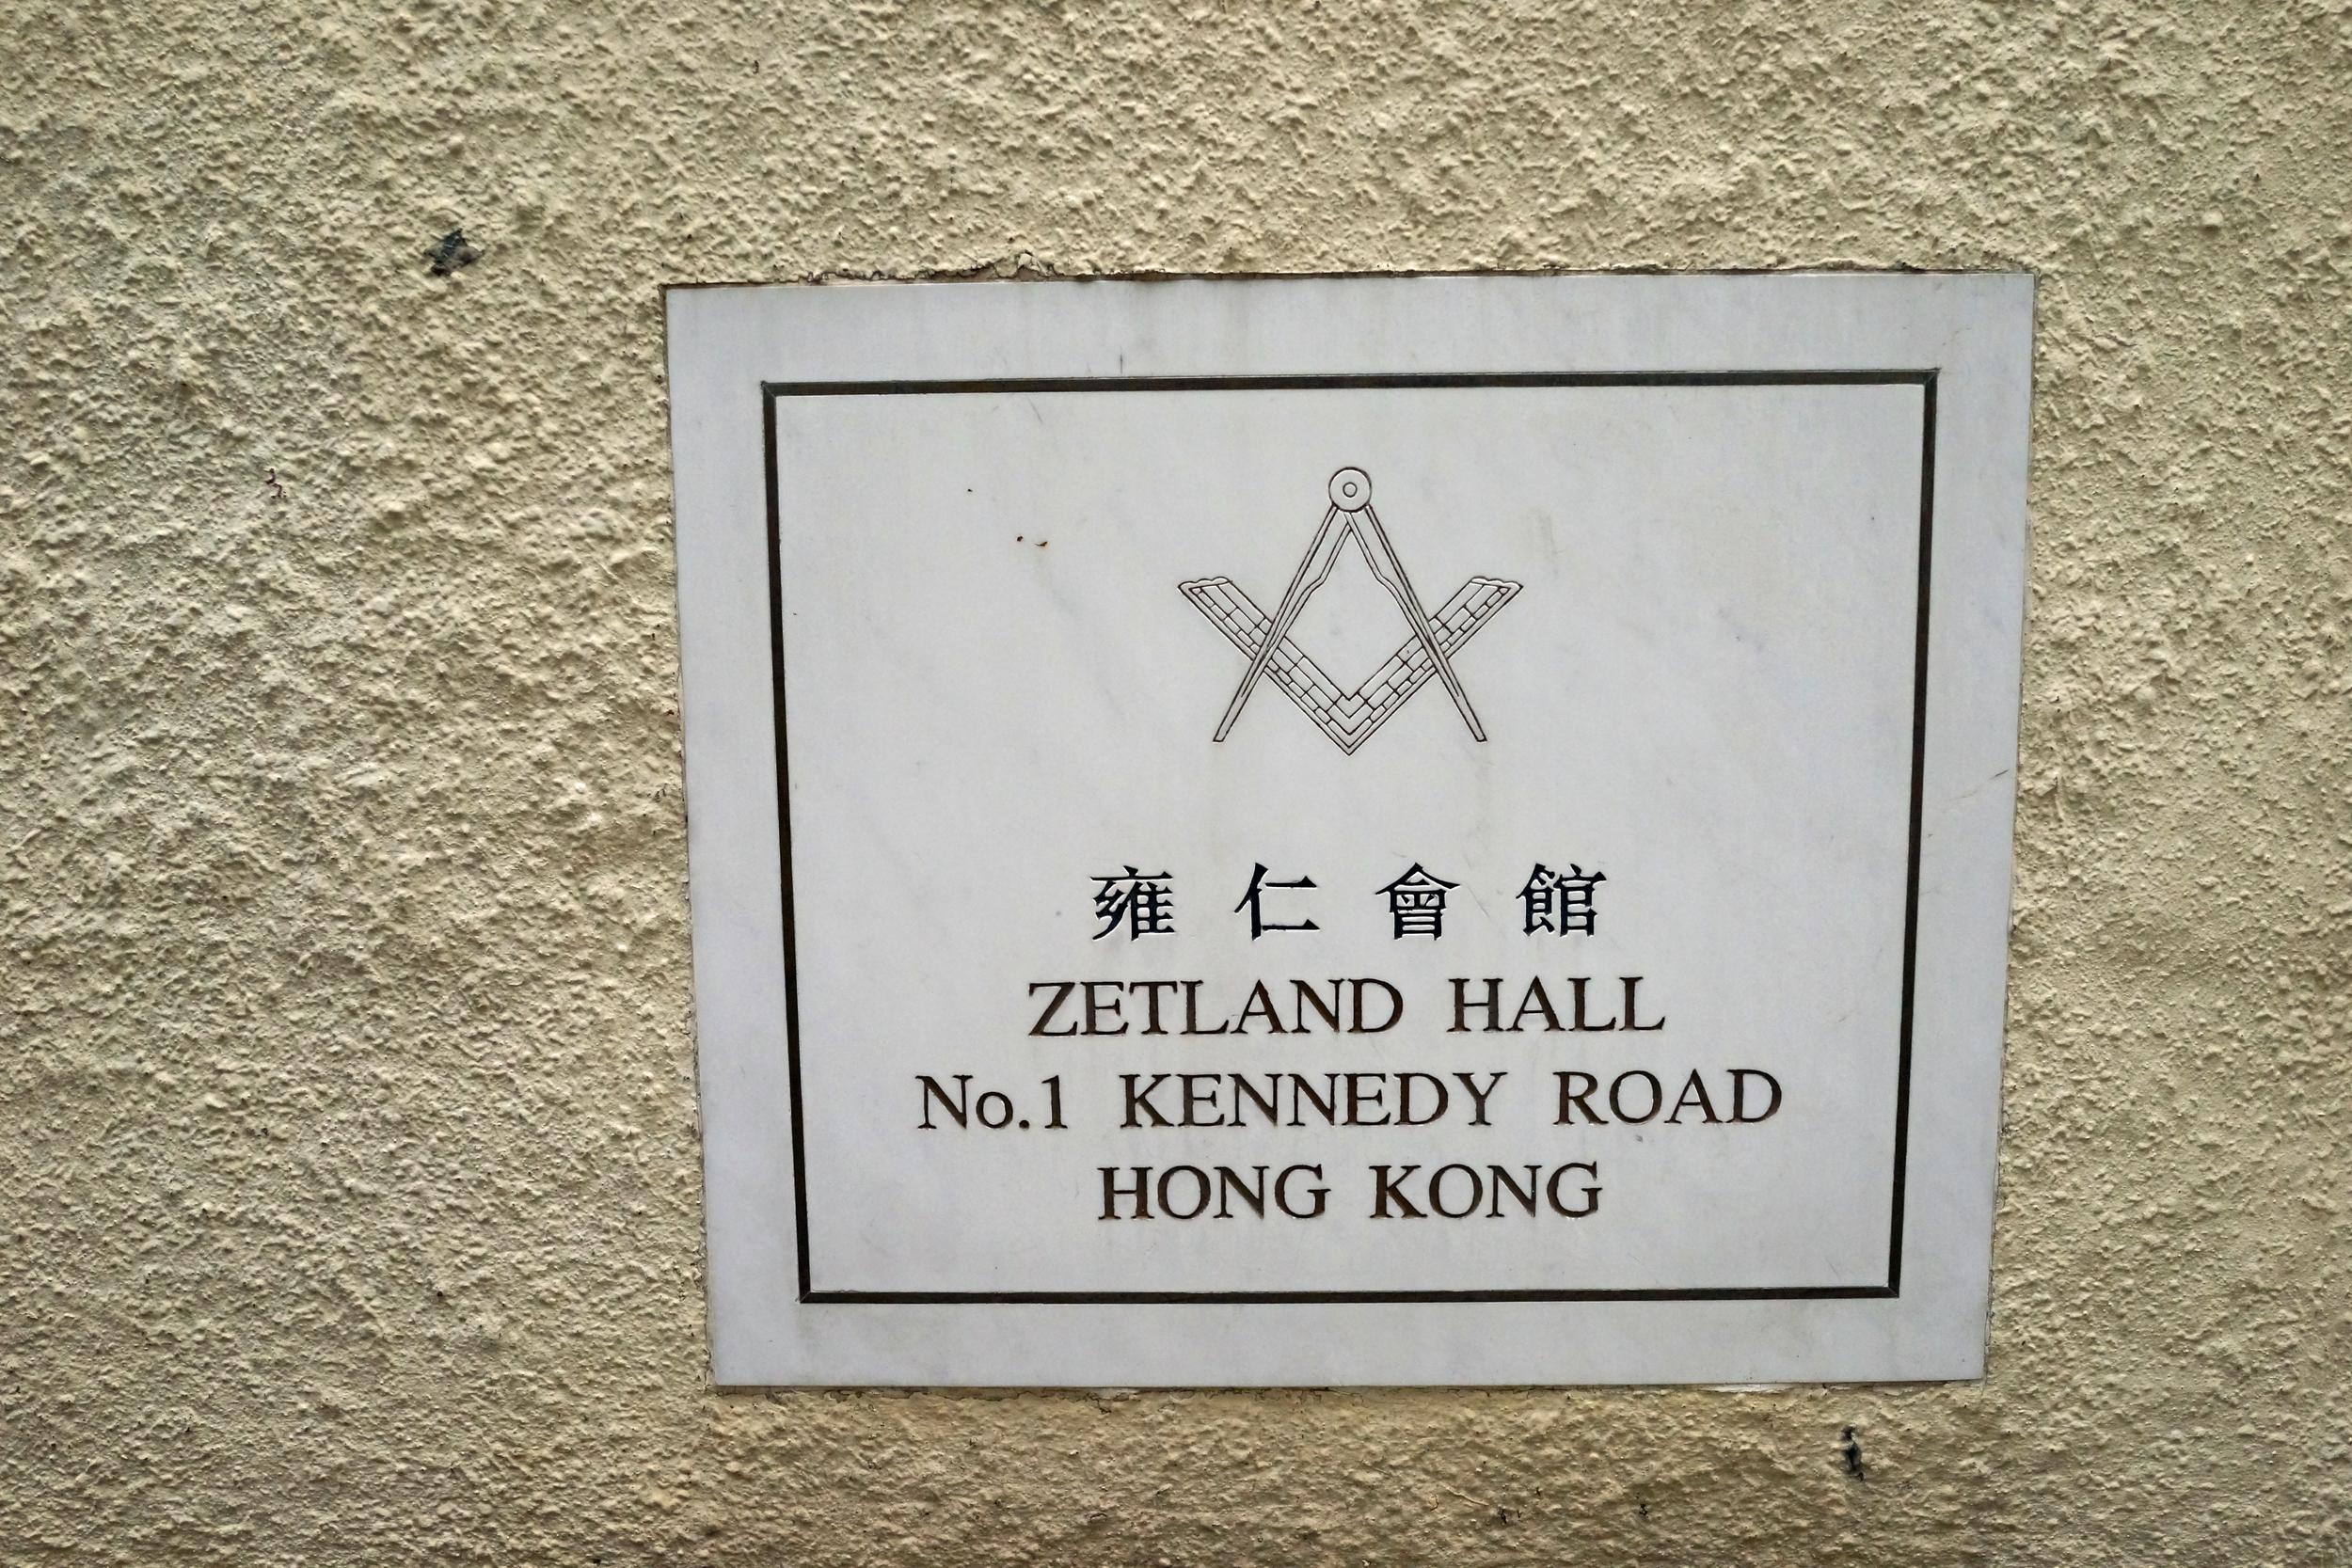 Zetland Hall - Hong Kong's most famous Freemasons Lodge